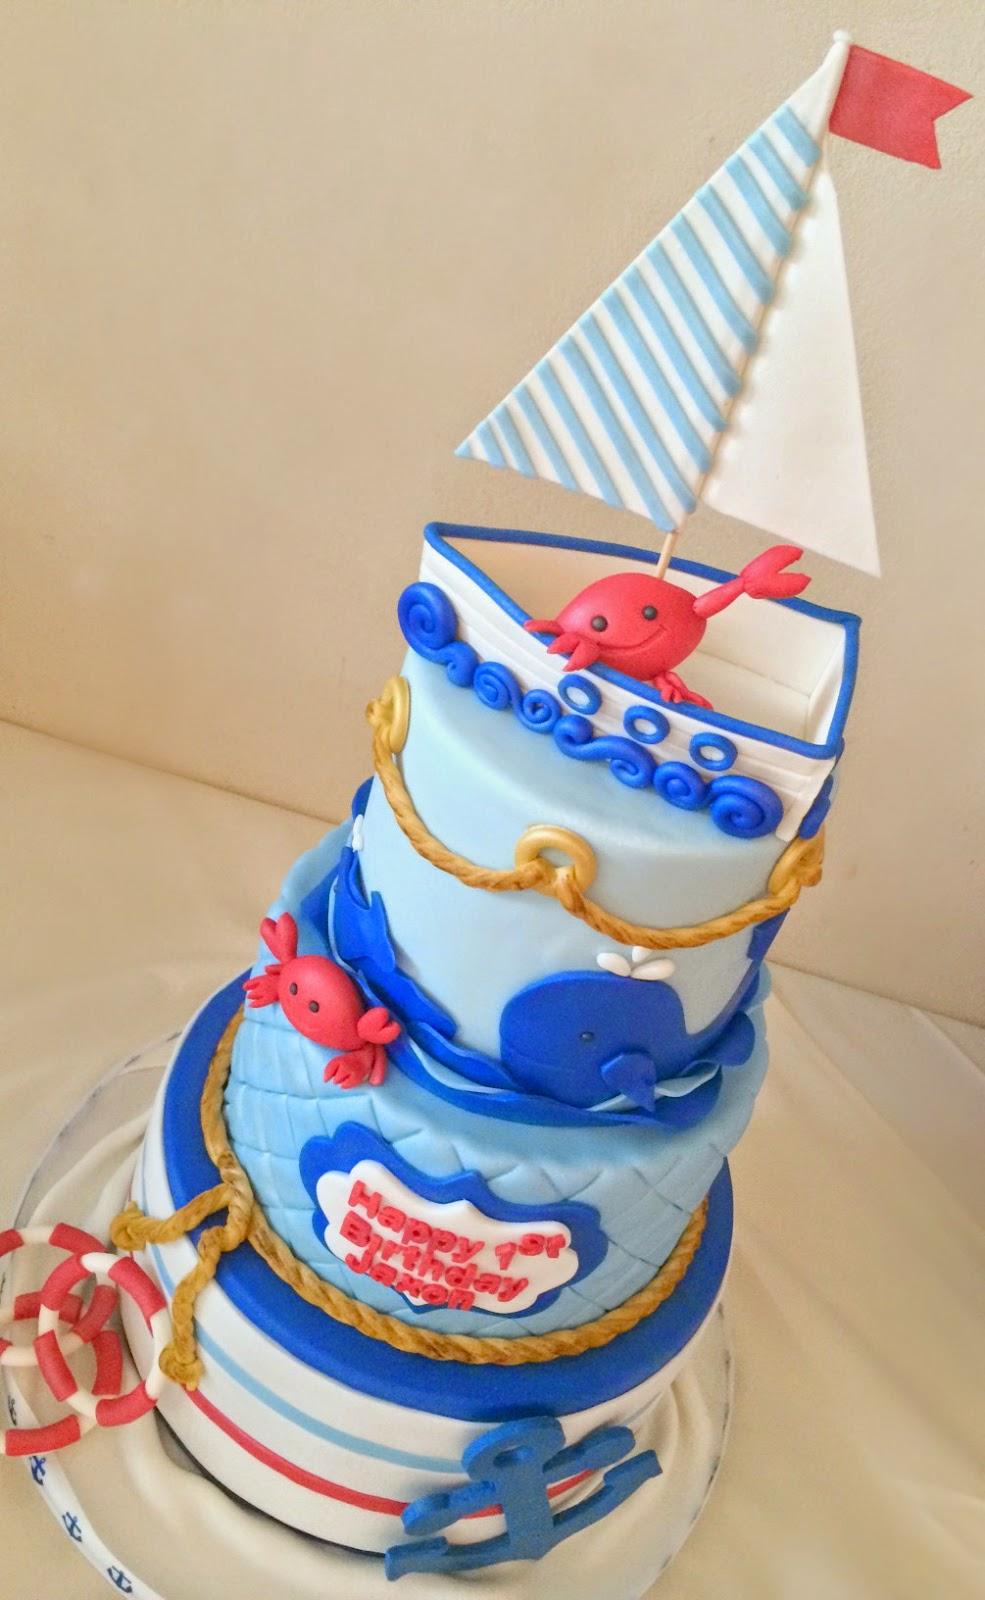 My Pink Little Cake Little Crabnautical Theme 1sr Birthday Cake